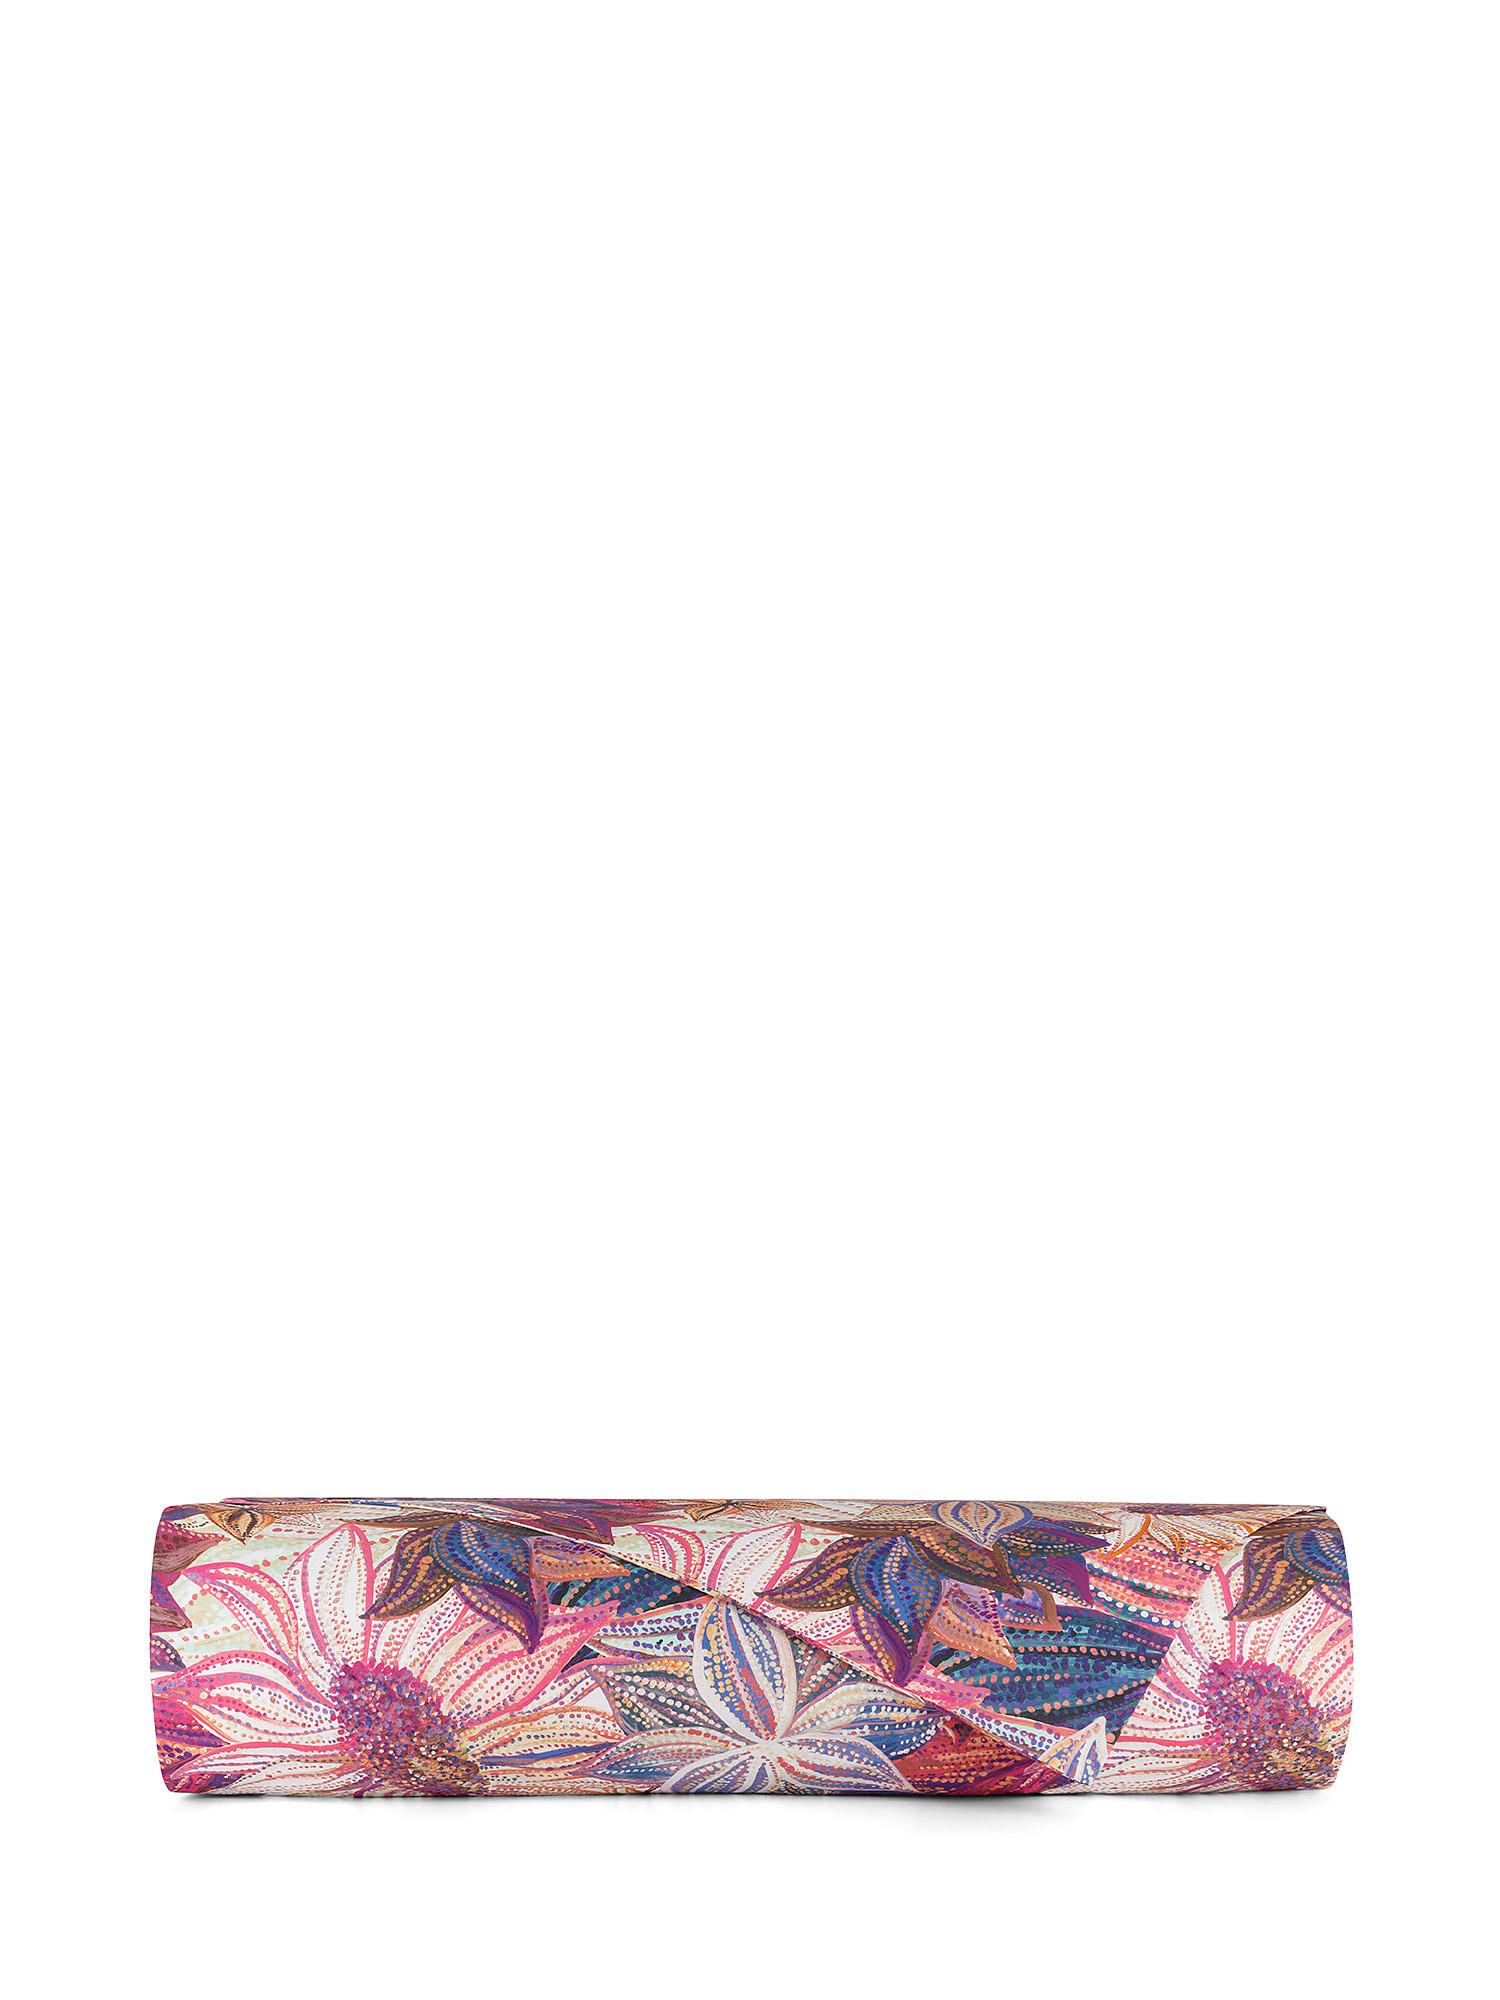 Copripiumino cotone percalle fantasia floreale, Multicolor, large image number 1